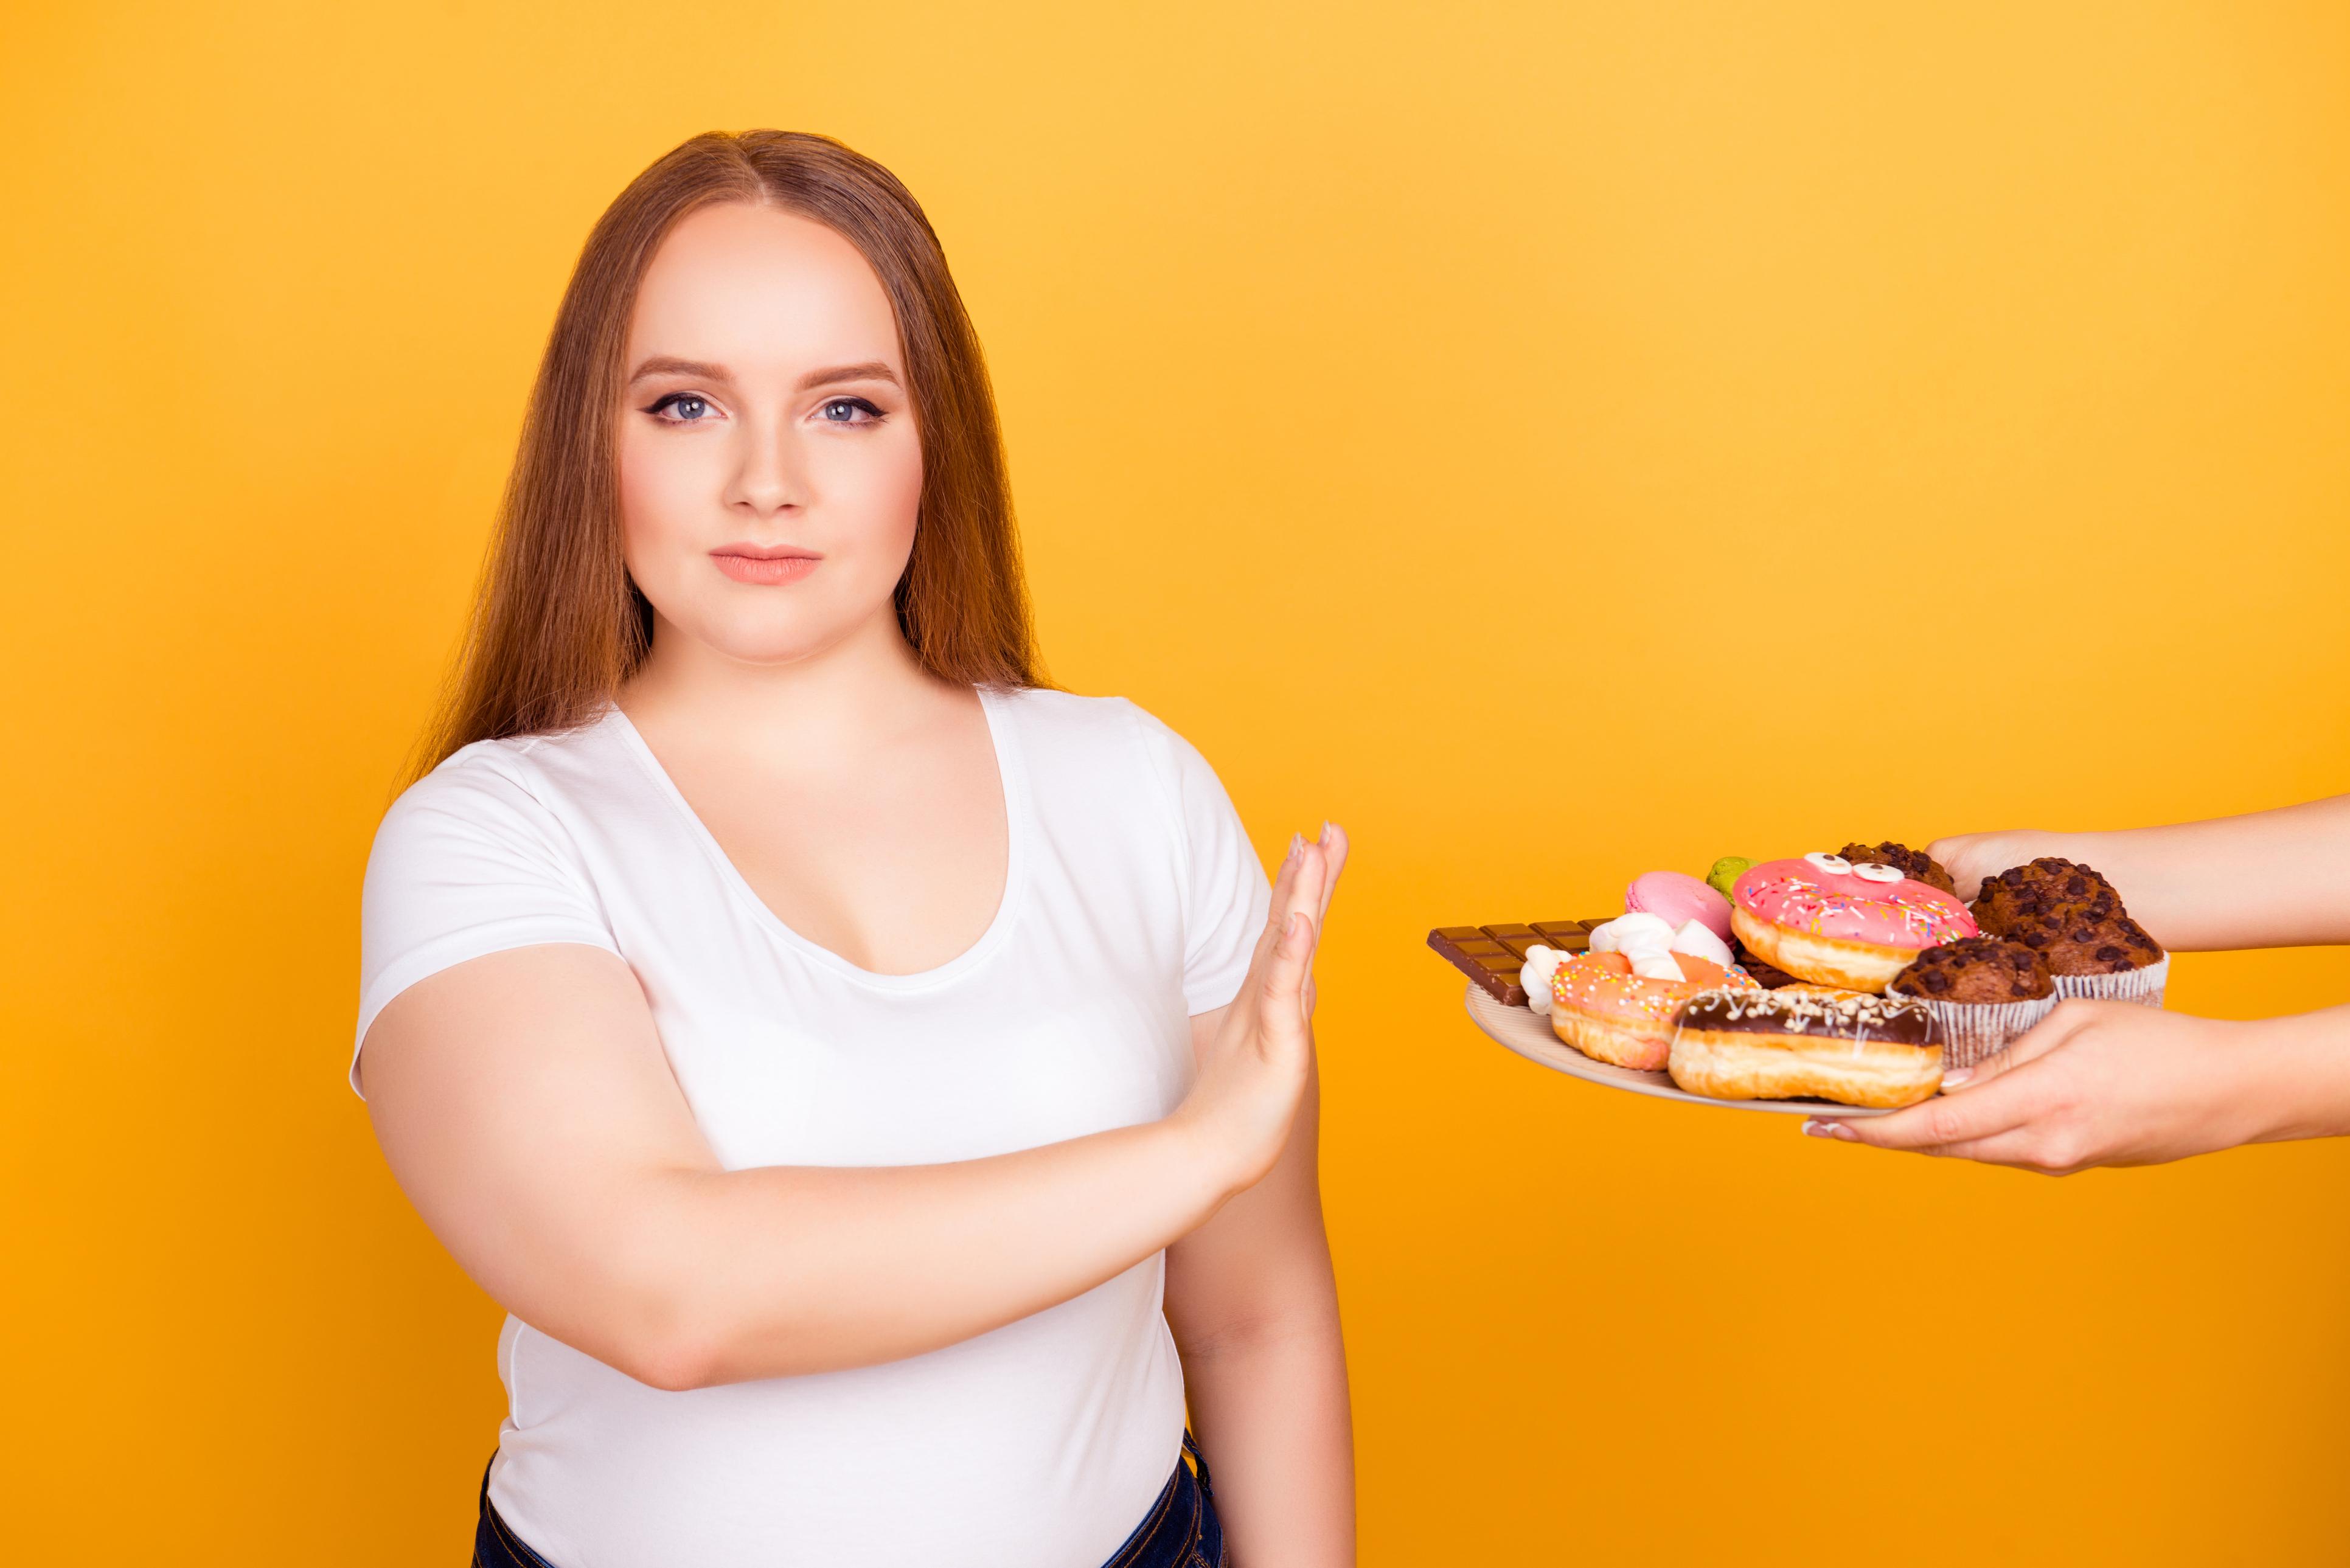 5 Ways to Manage Cravings